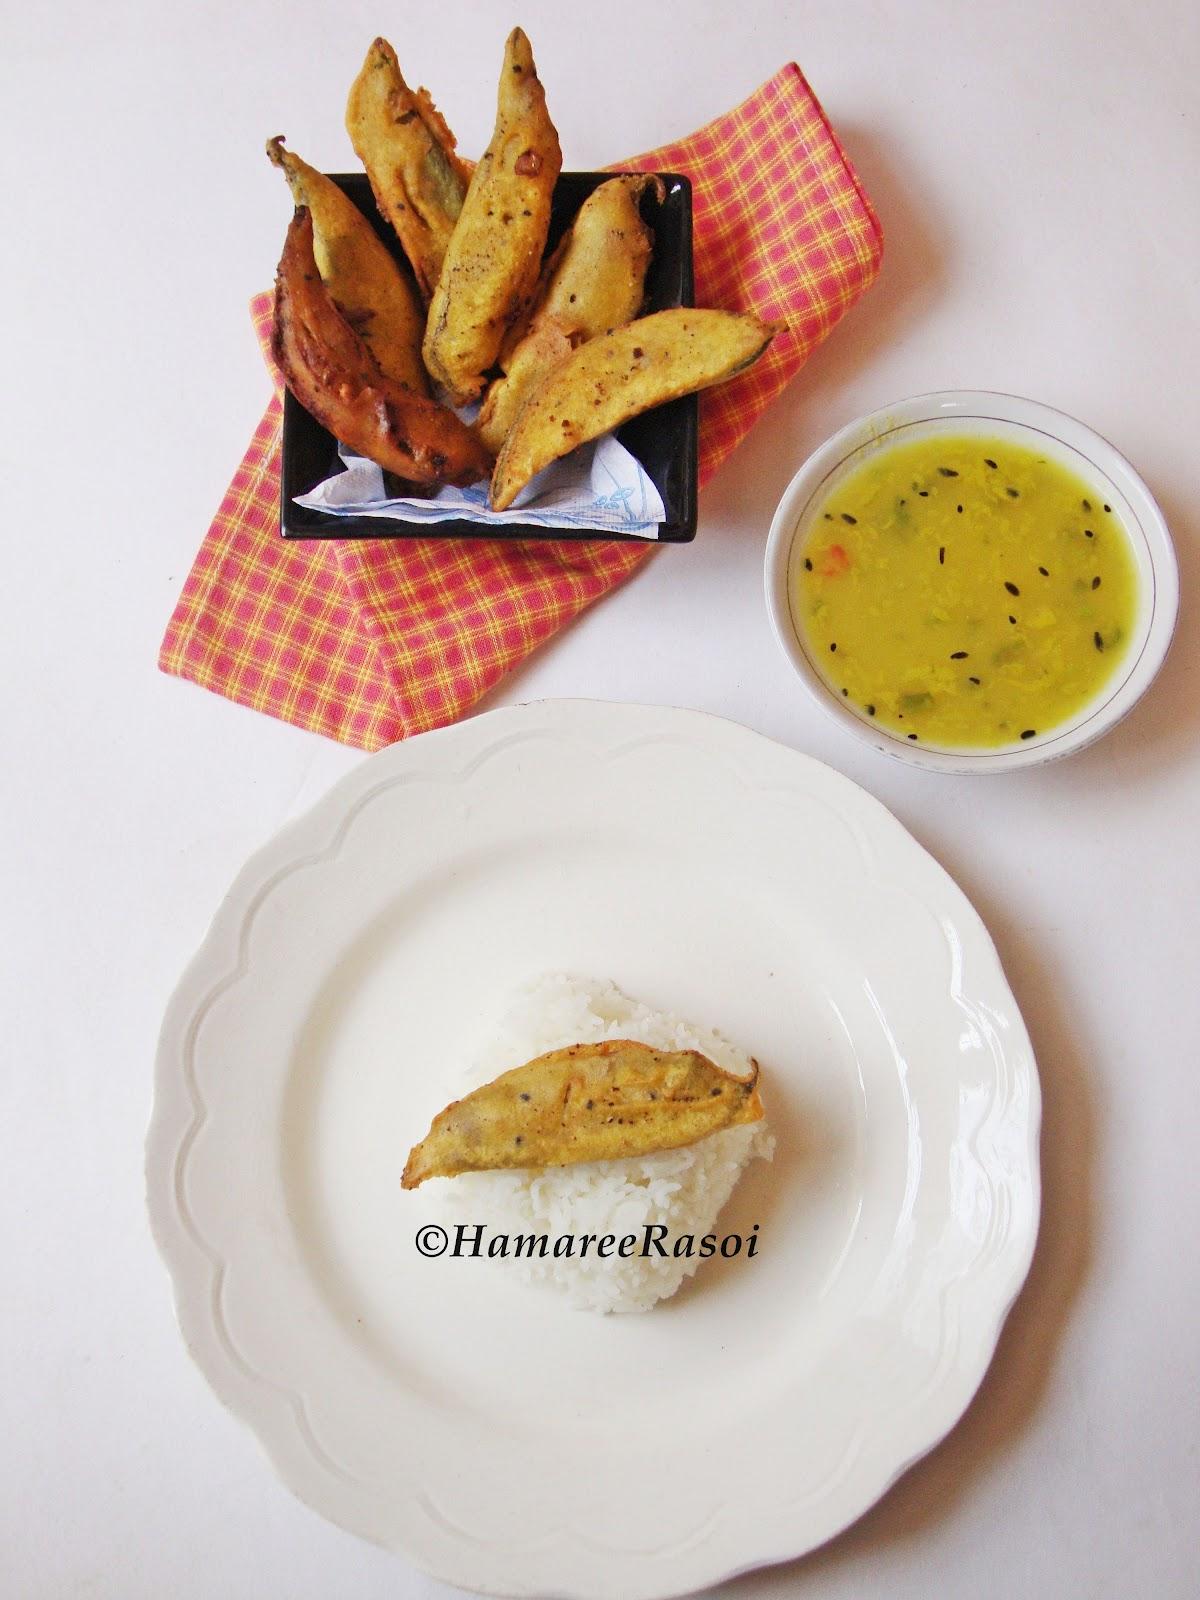 Hamaree rasoi: Stuffed Hyacinth Beans Fry - Pur Diye Sheem Bhaja